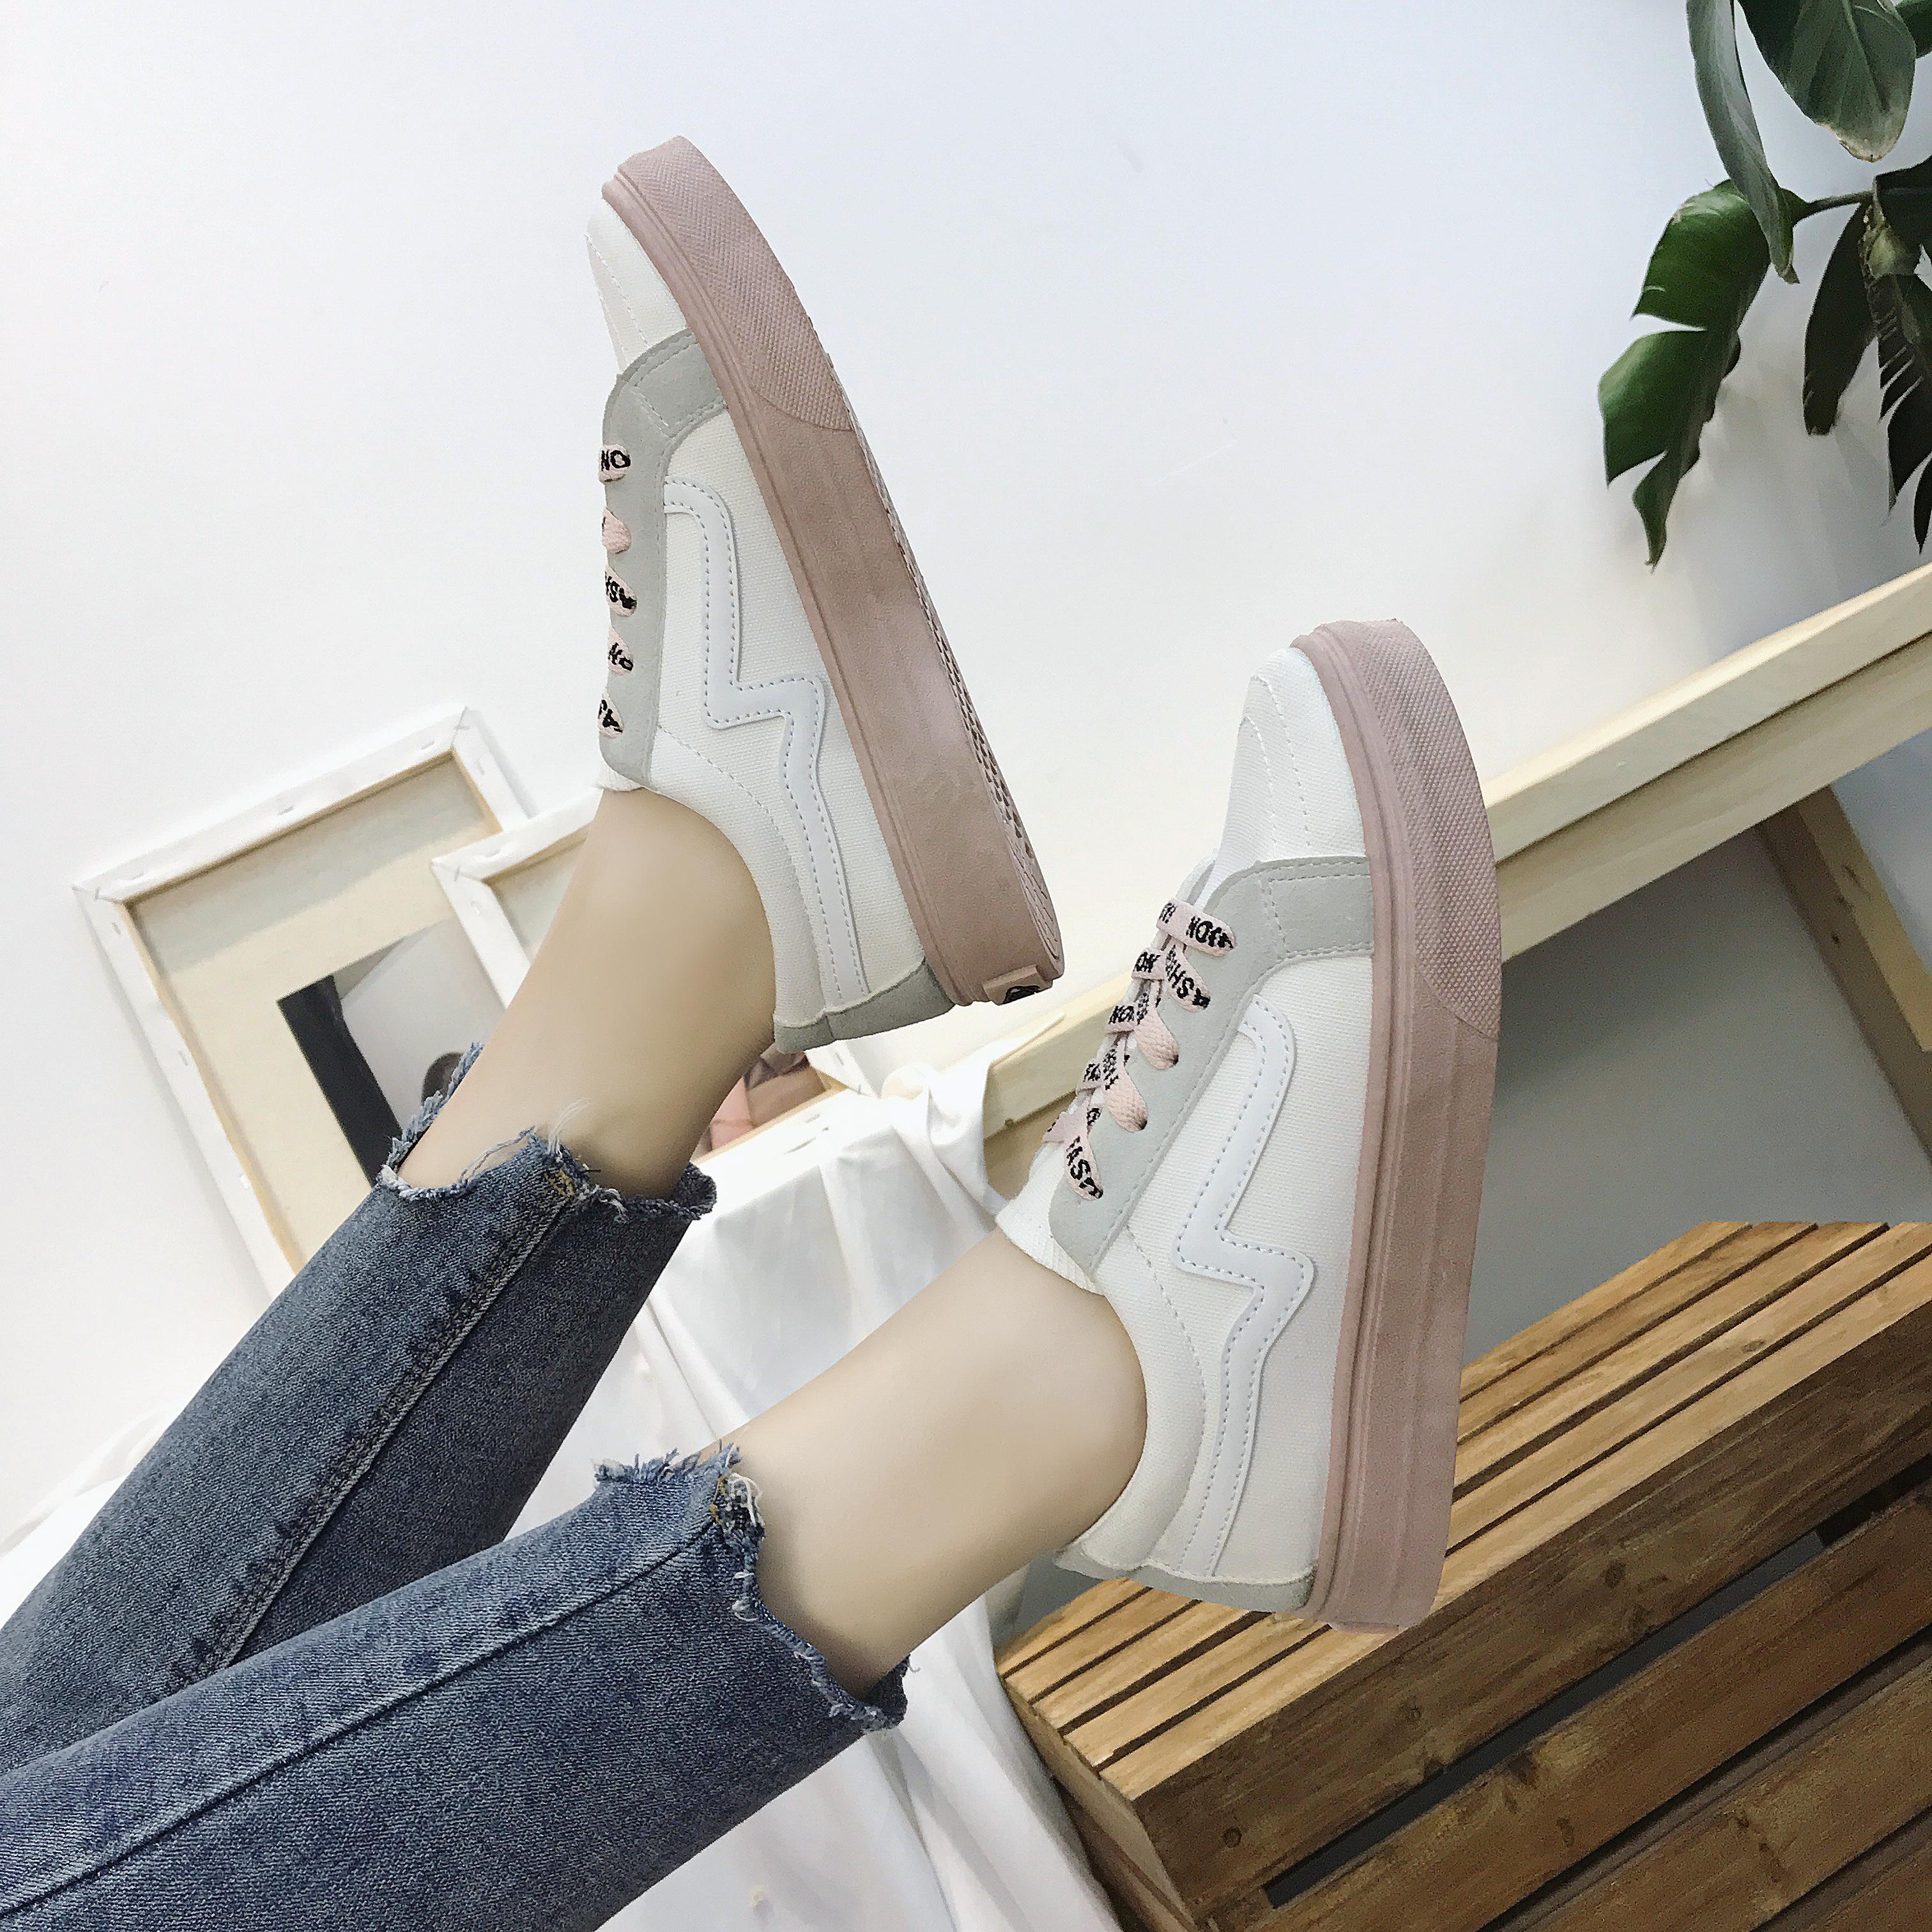 Women Retro Chic Lace Up Sneakers Ladies Street Wear Plus Size Sports Shoes